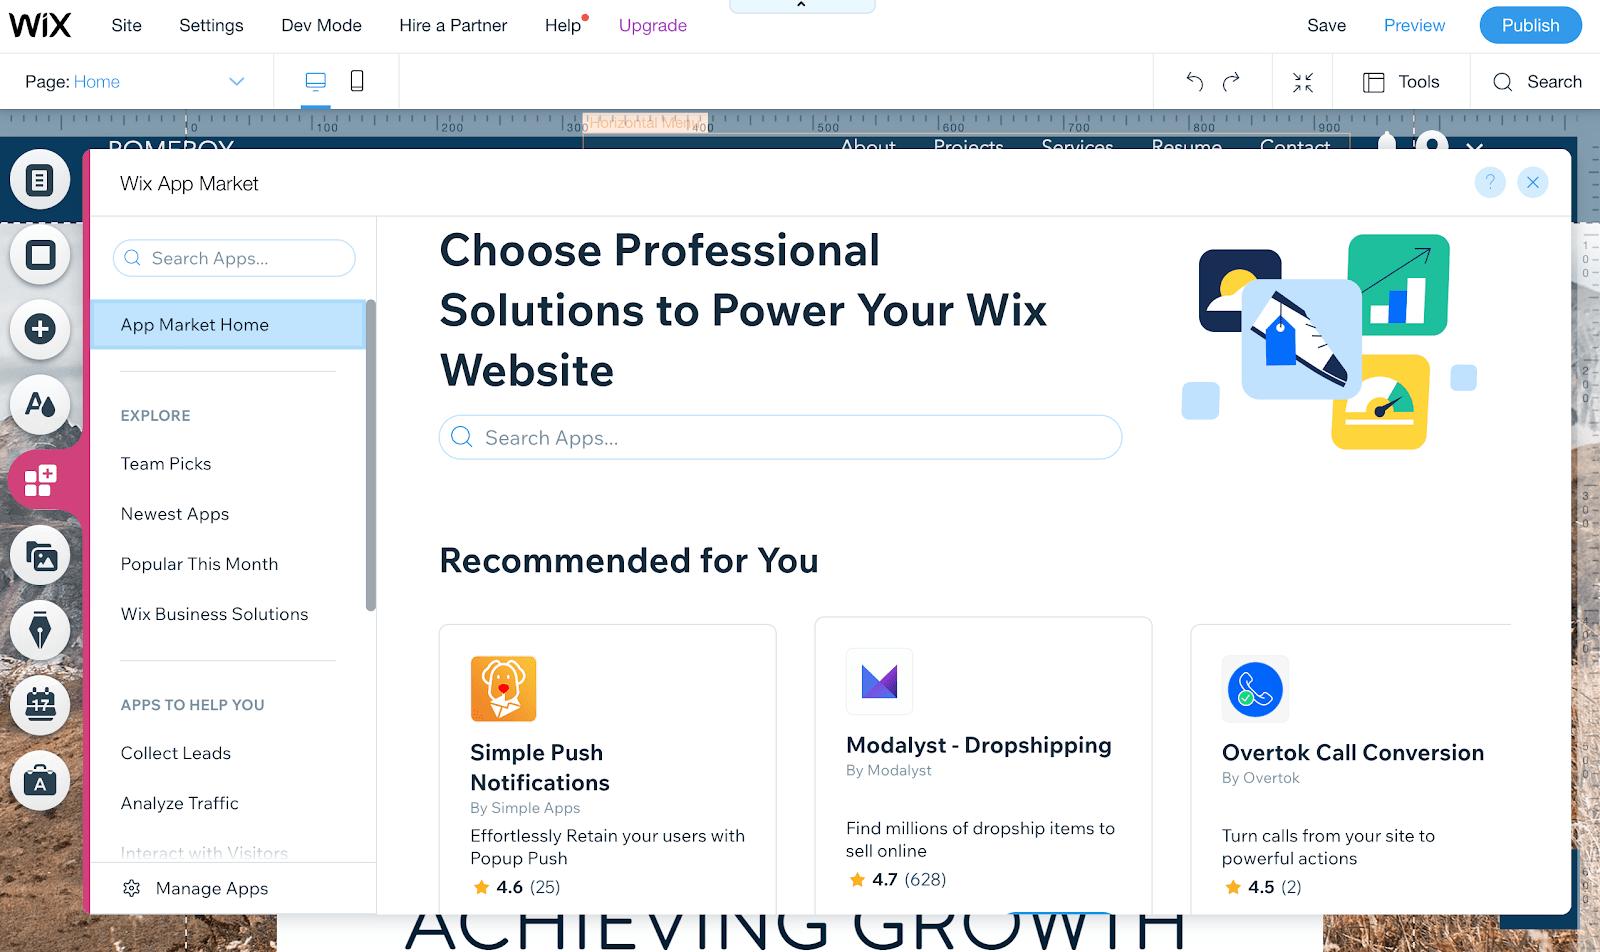 Wix - App Market